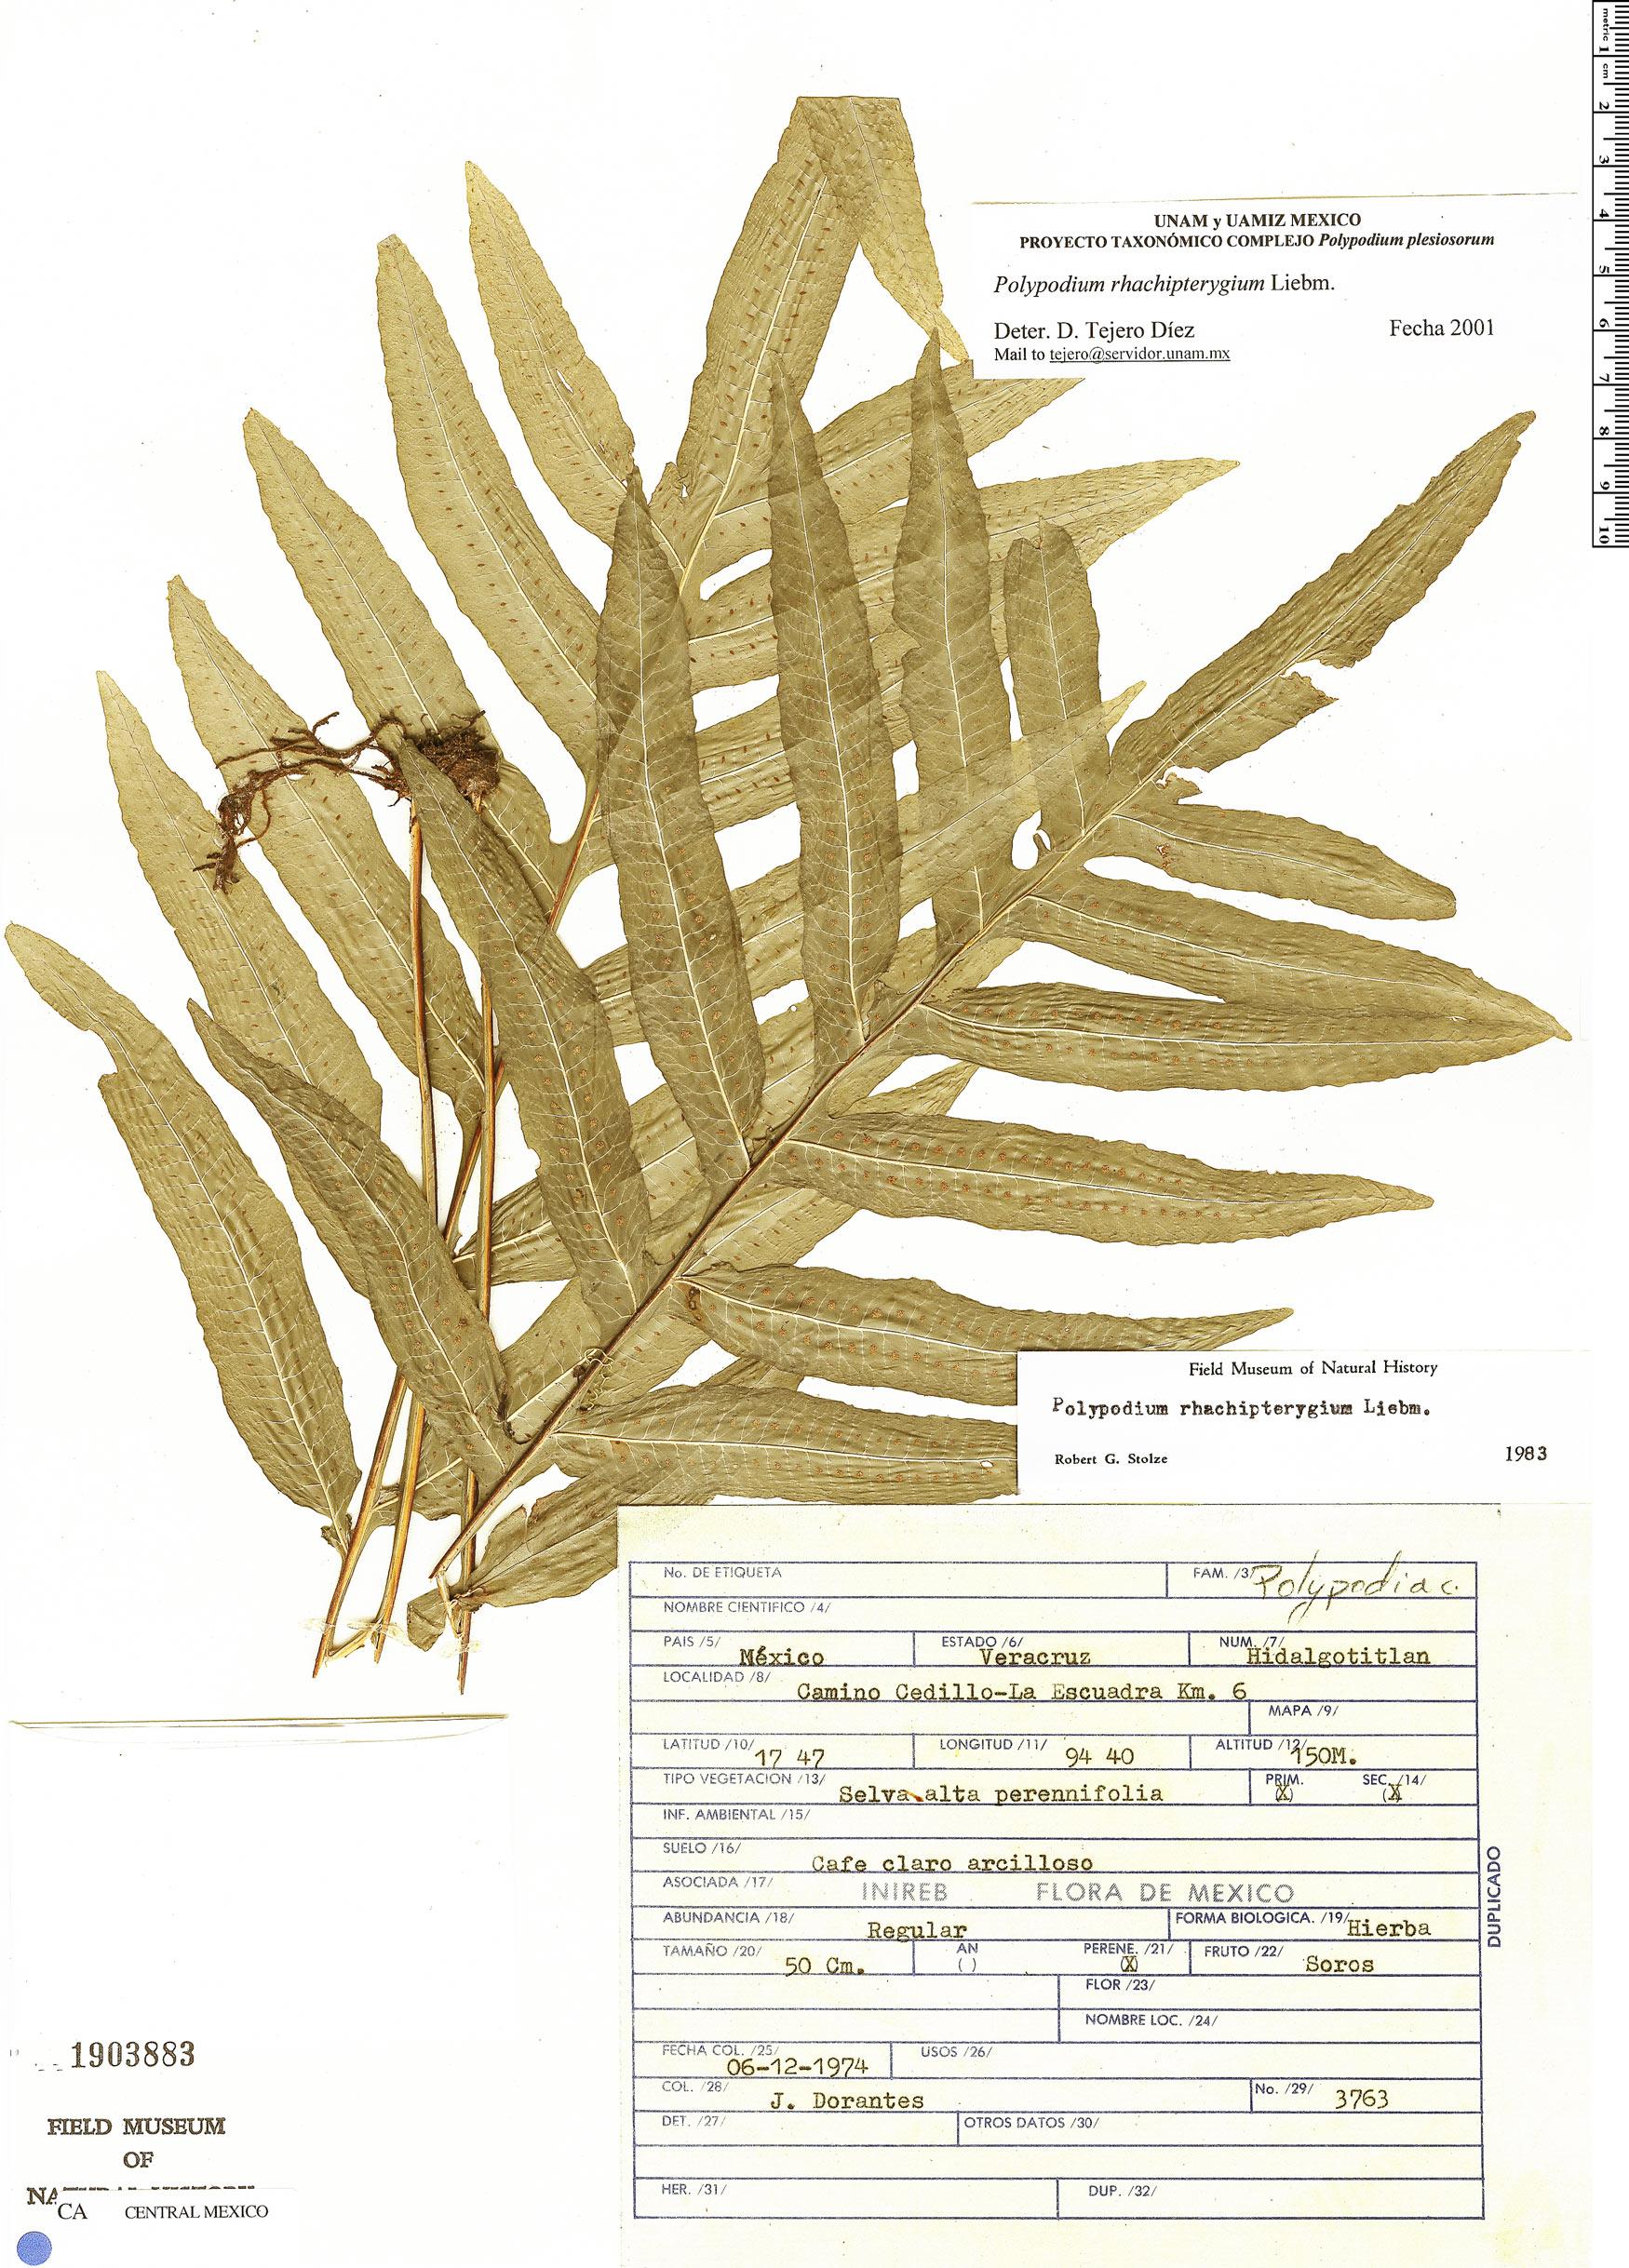 Specimen: Polypodium rhachipterygium